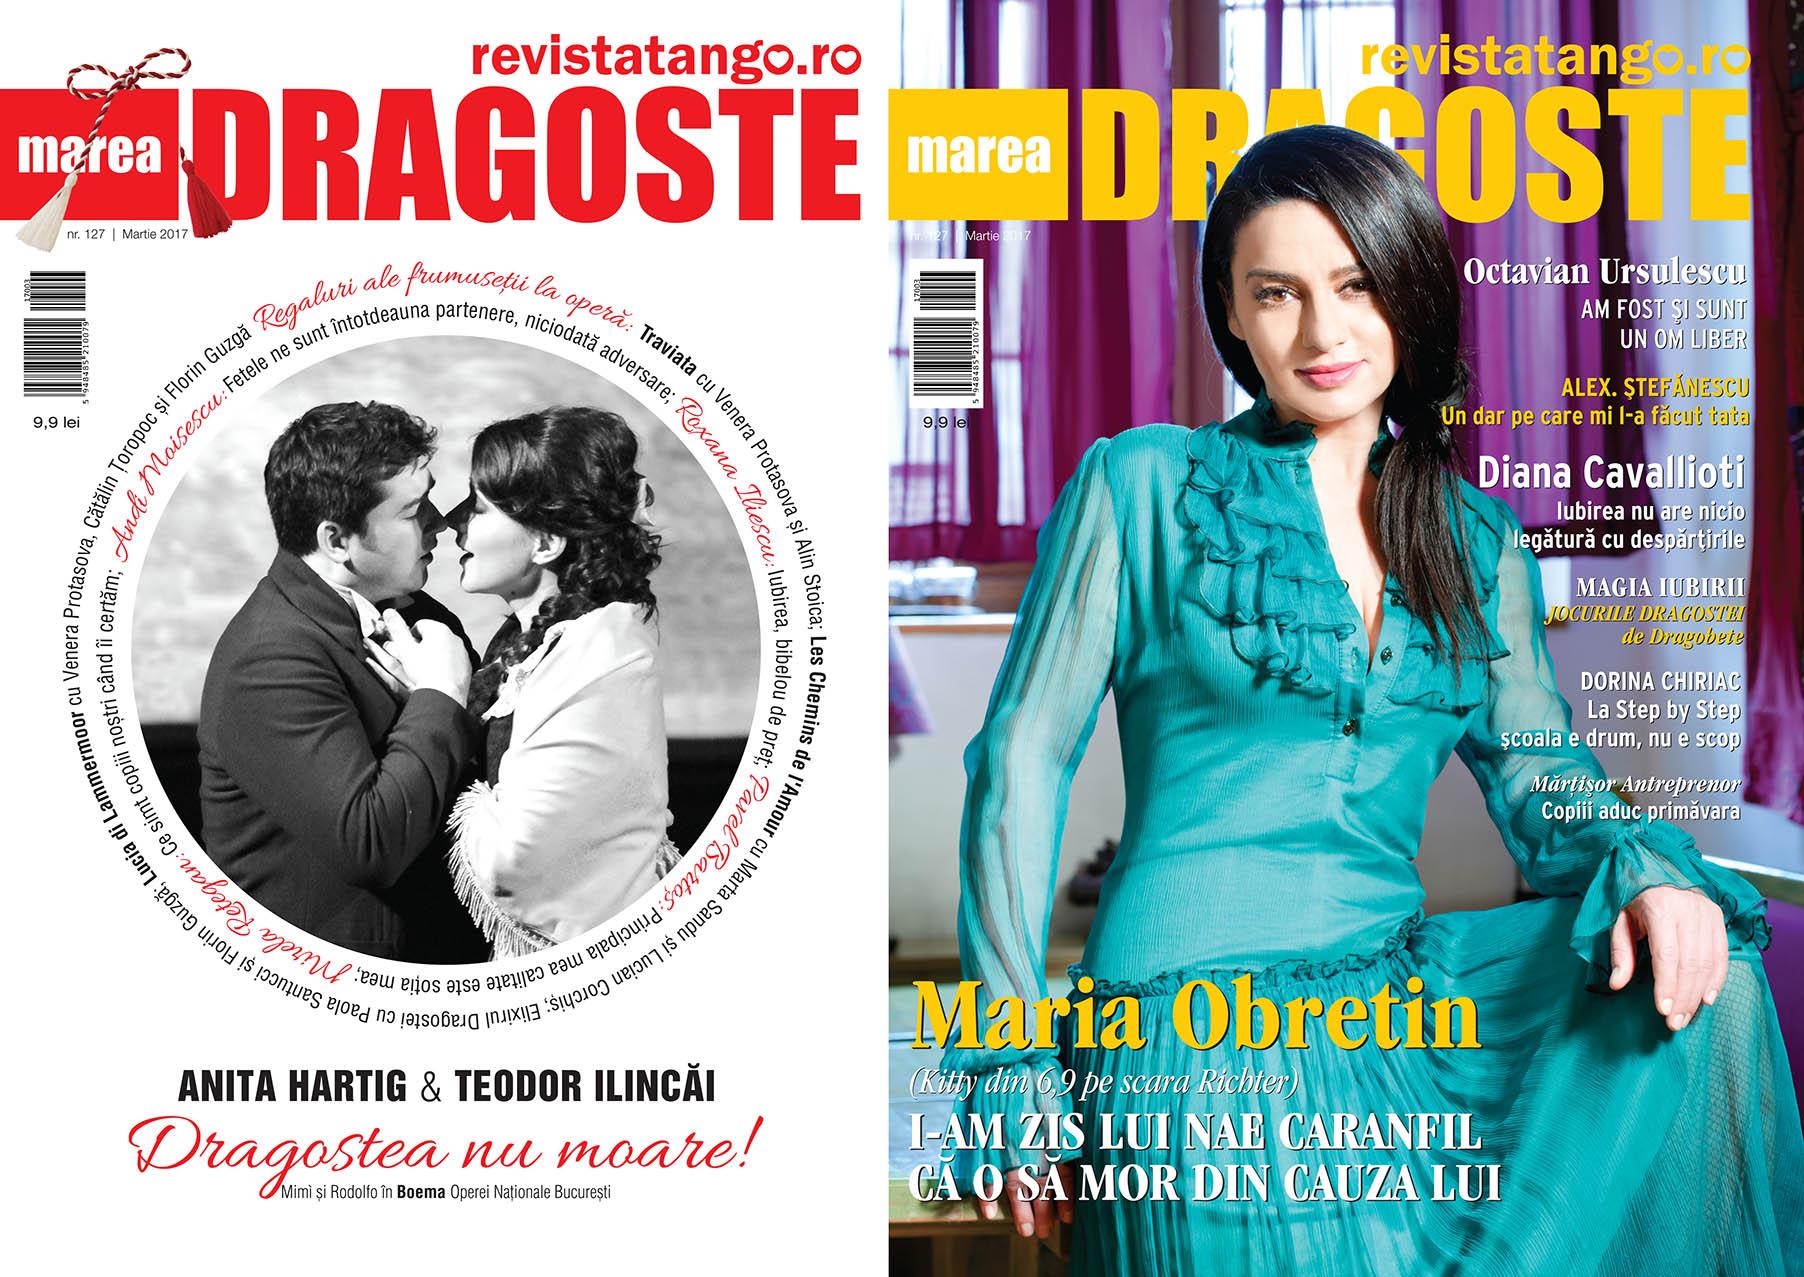 Anita Hartig (Mimi) si Teodor Ilincai (Rodolfo) in Boema; Maria Obretin pe copertele Marea Dragoste-revistatango.ro, nr. 127, martie 2017